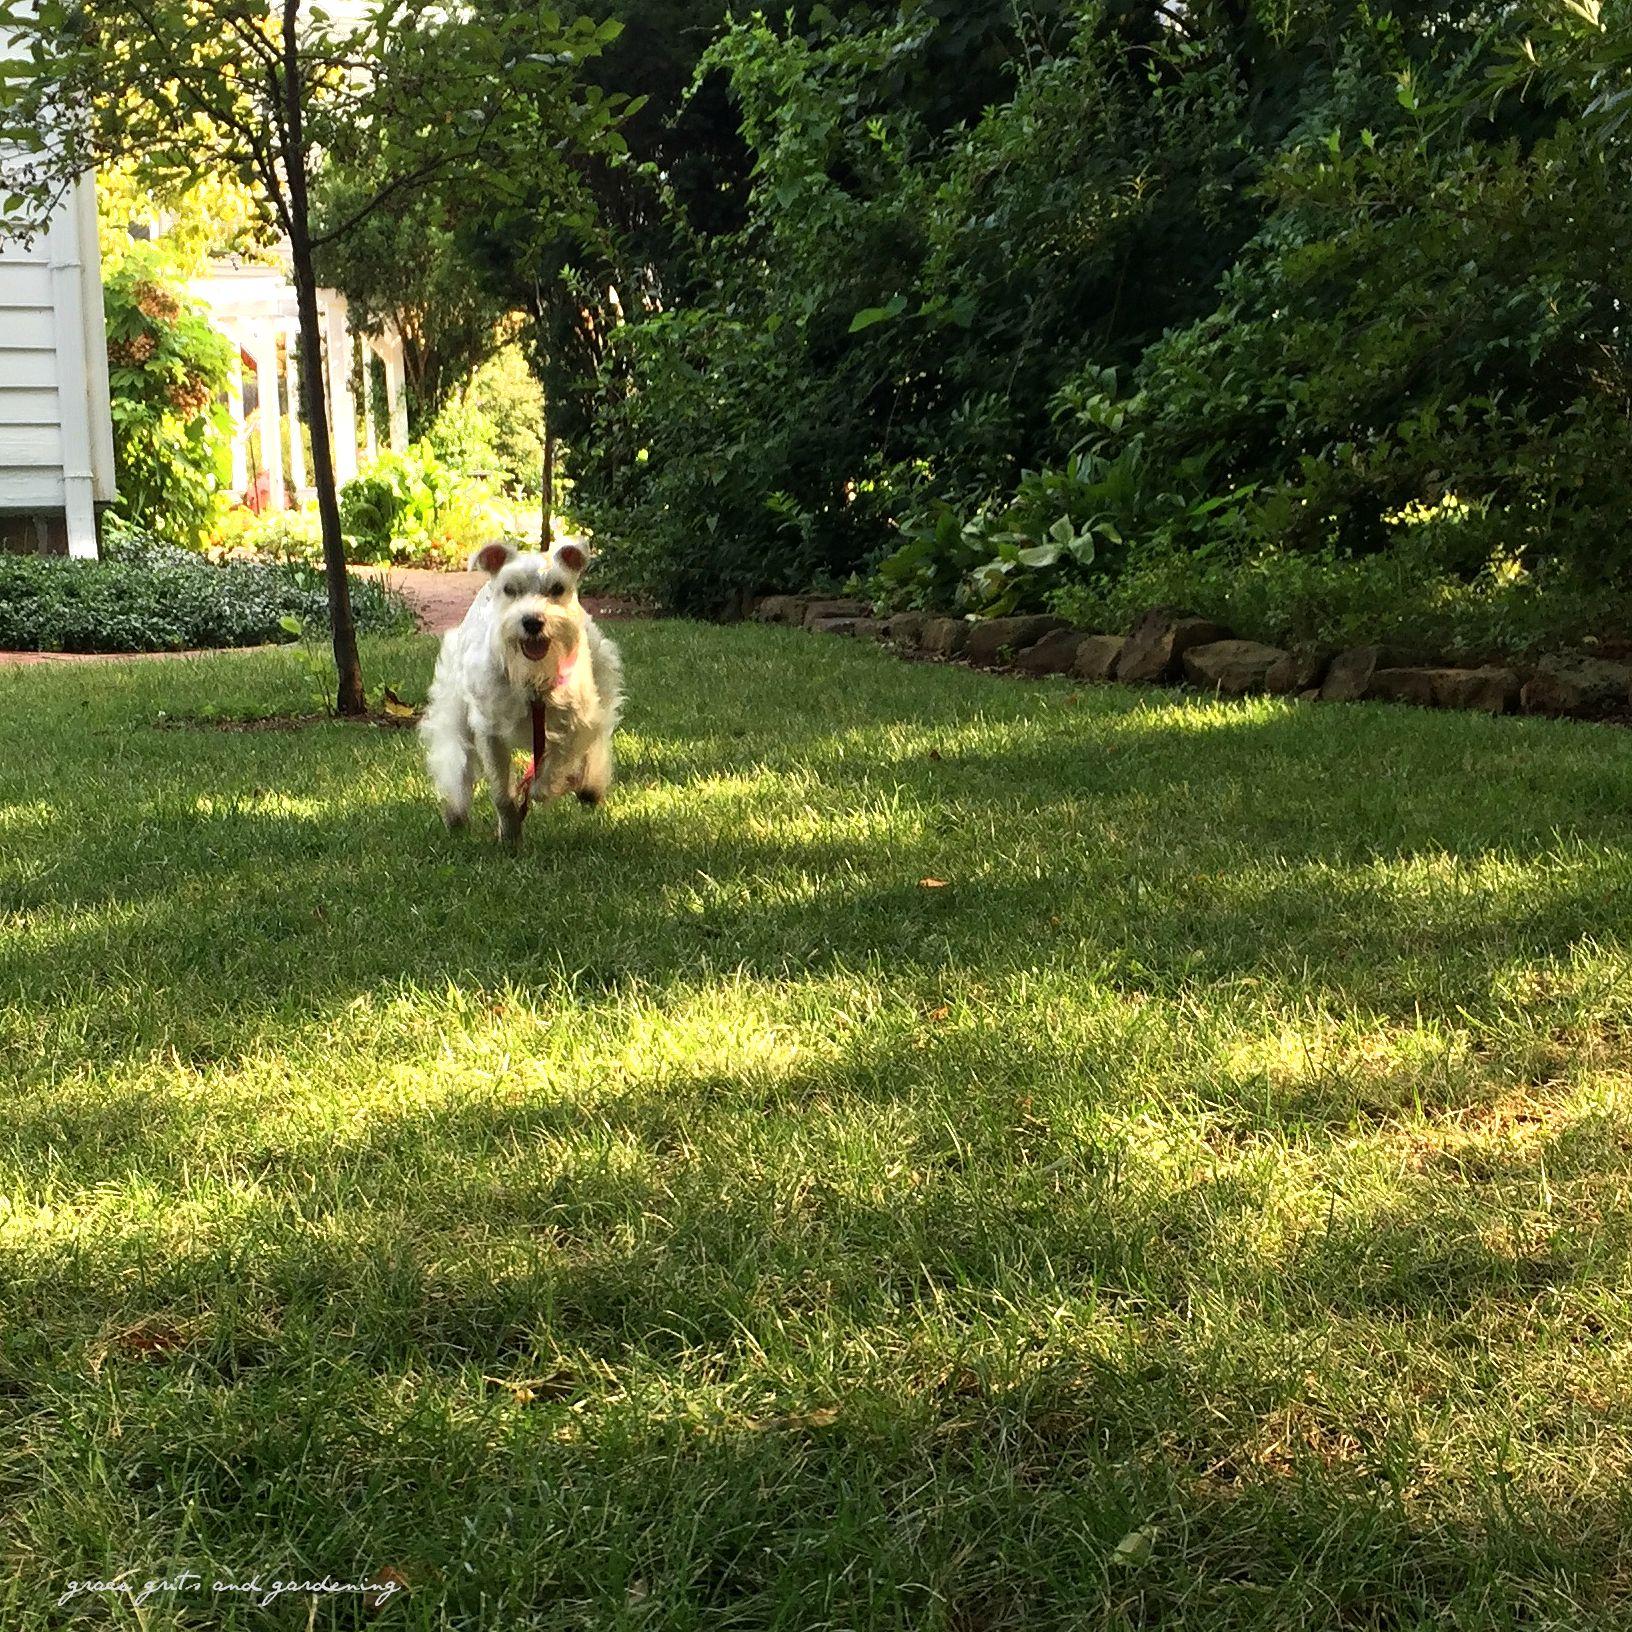 Annabelle chasing summer